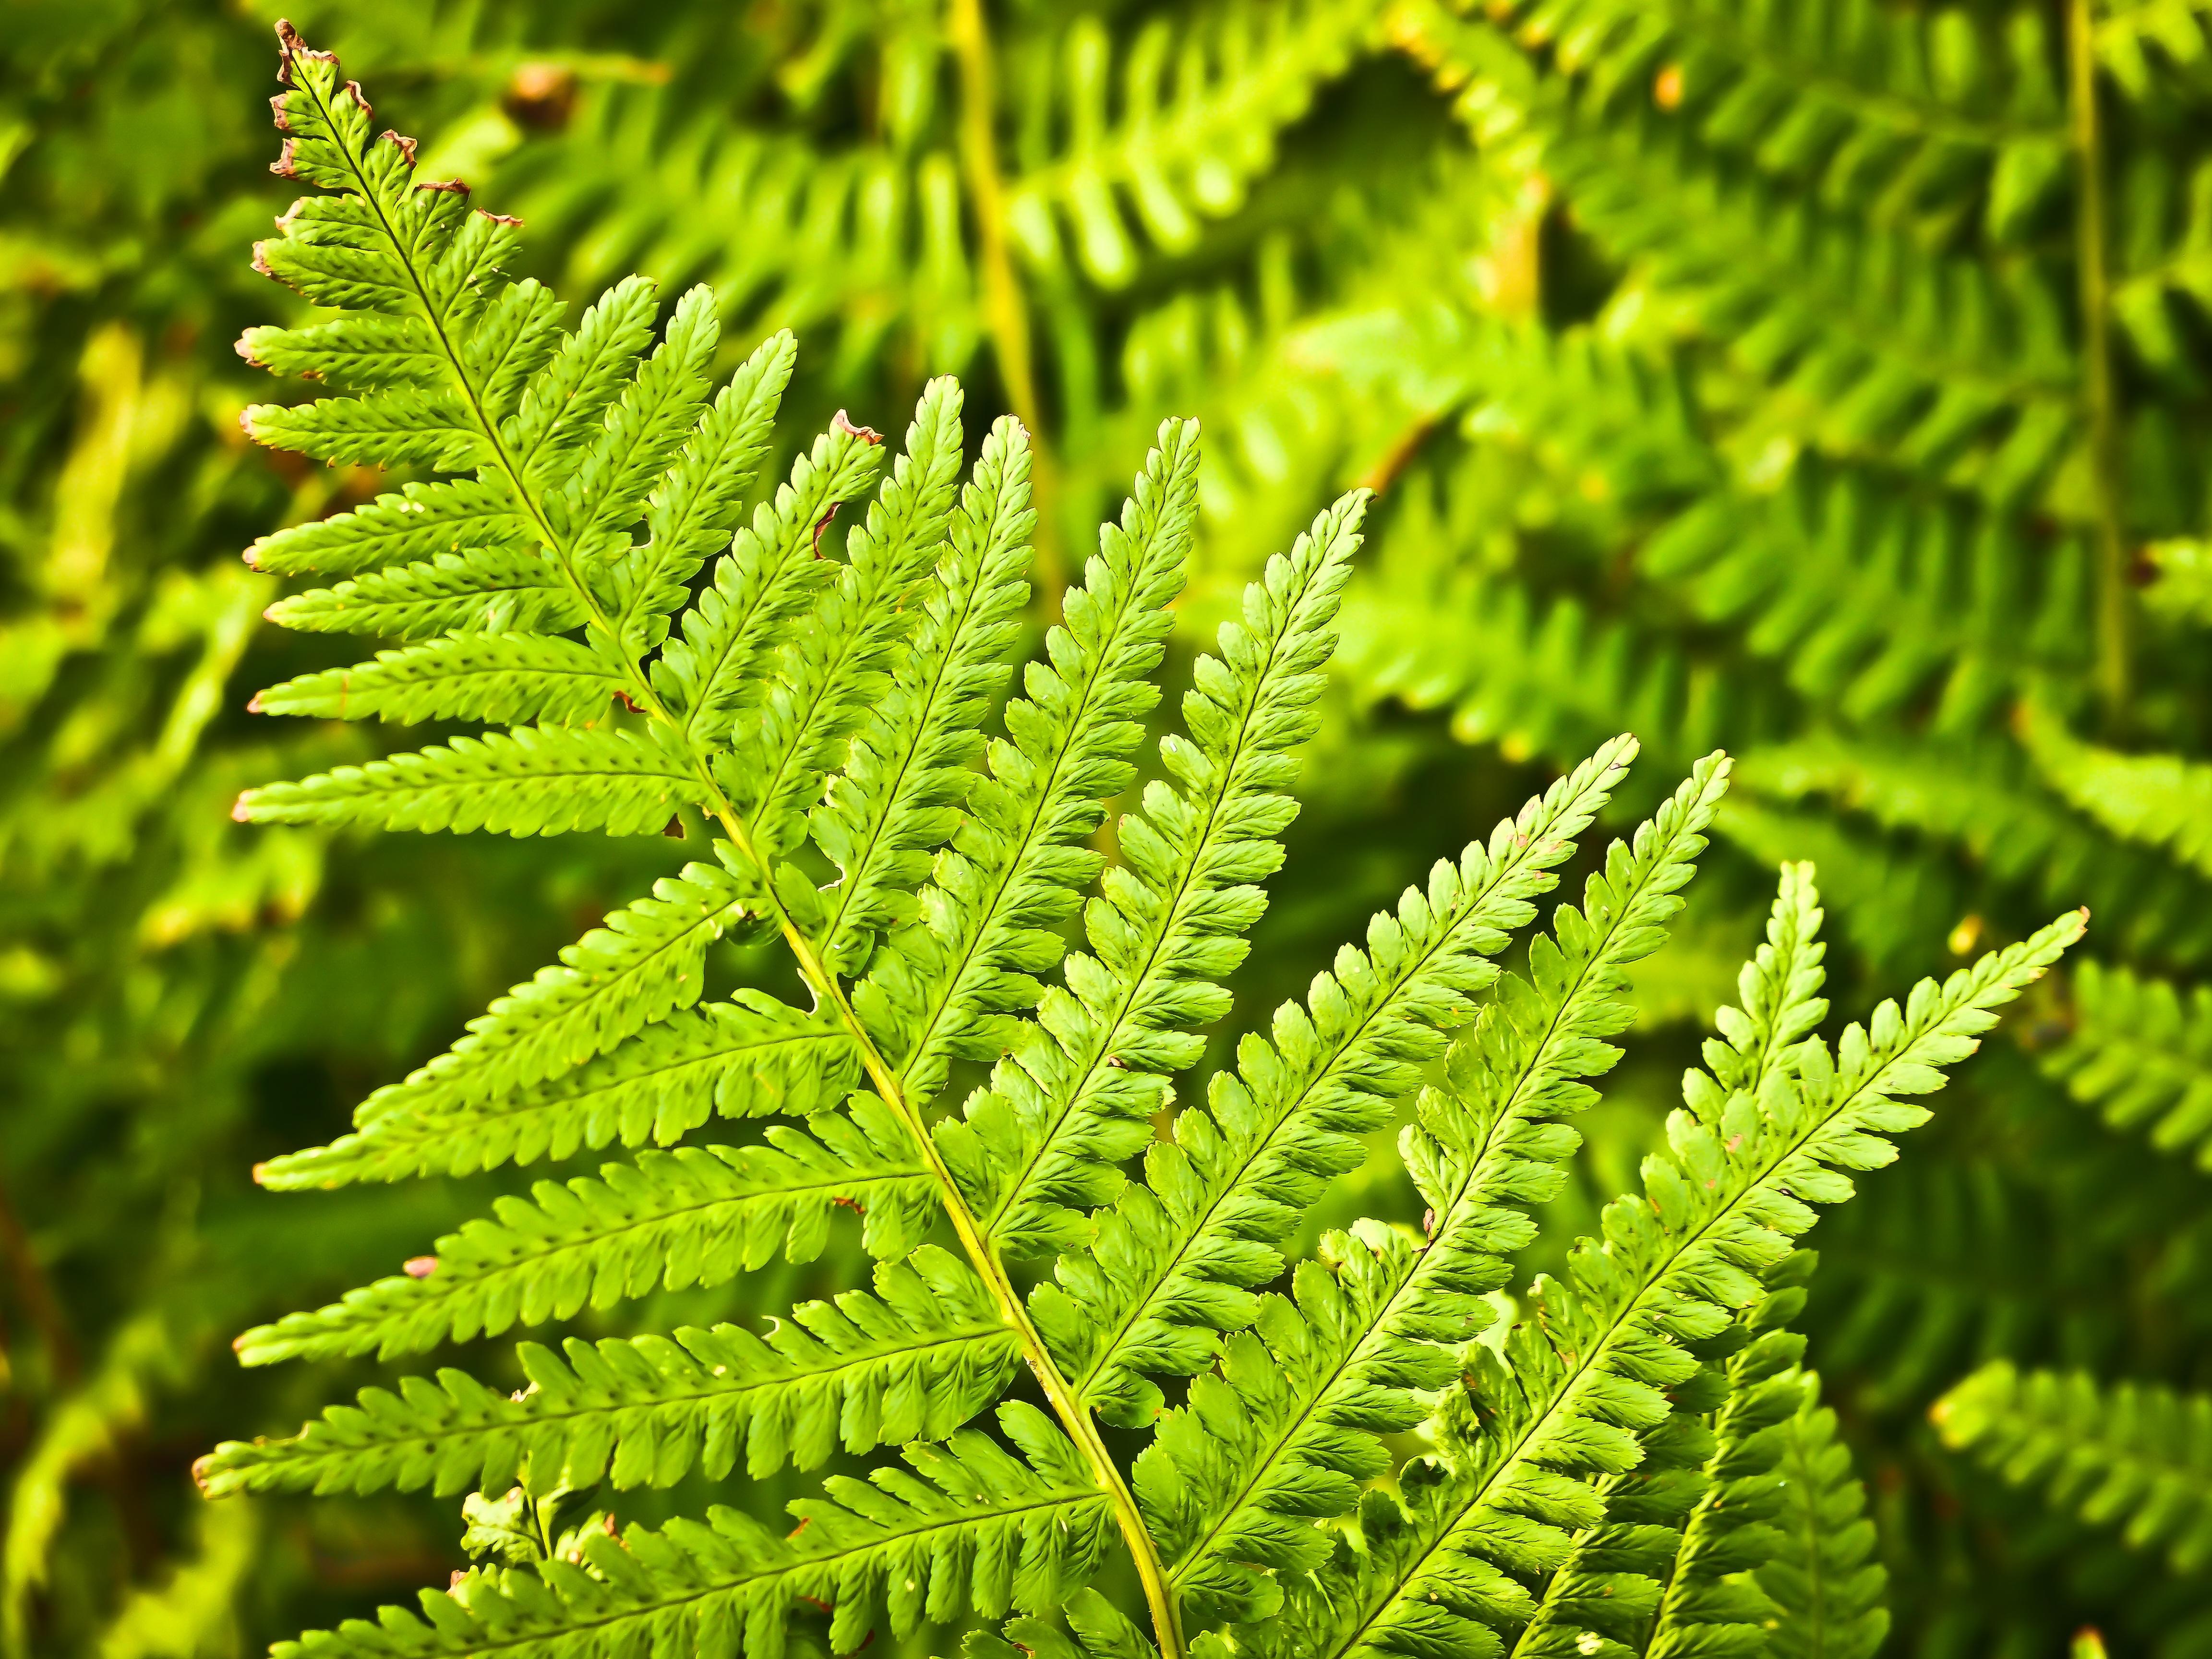 fern-nature-green-plant